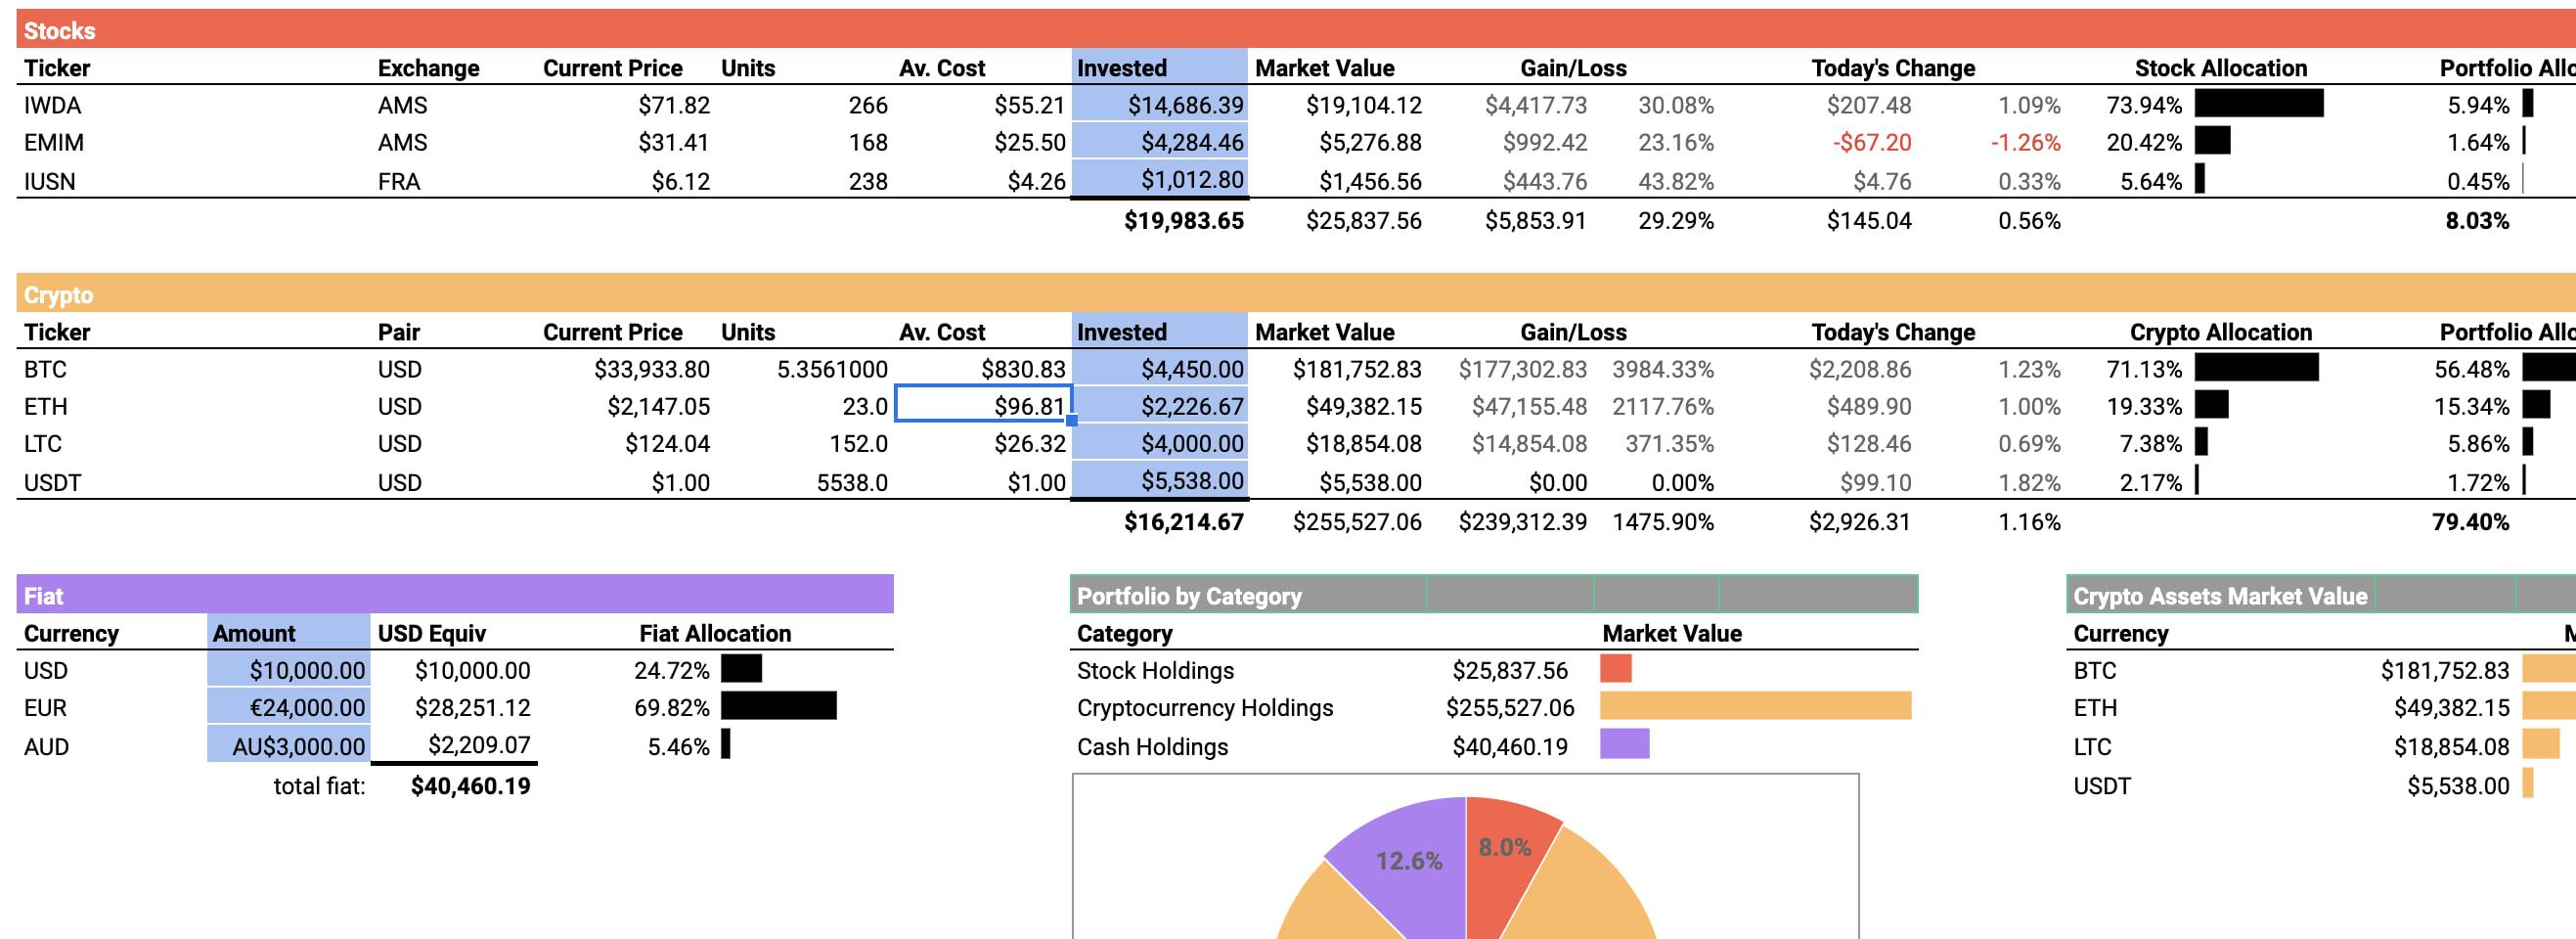 Portfolio Diversification Template (Google Spreadsheets) - Stocks, Crypto, Fiat